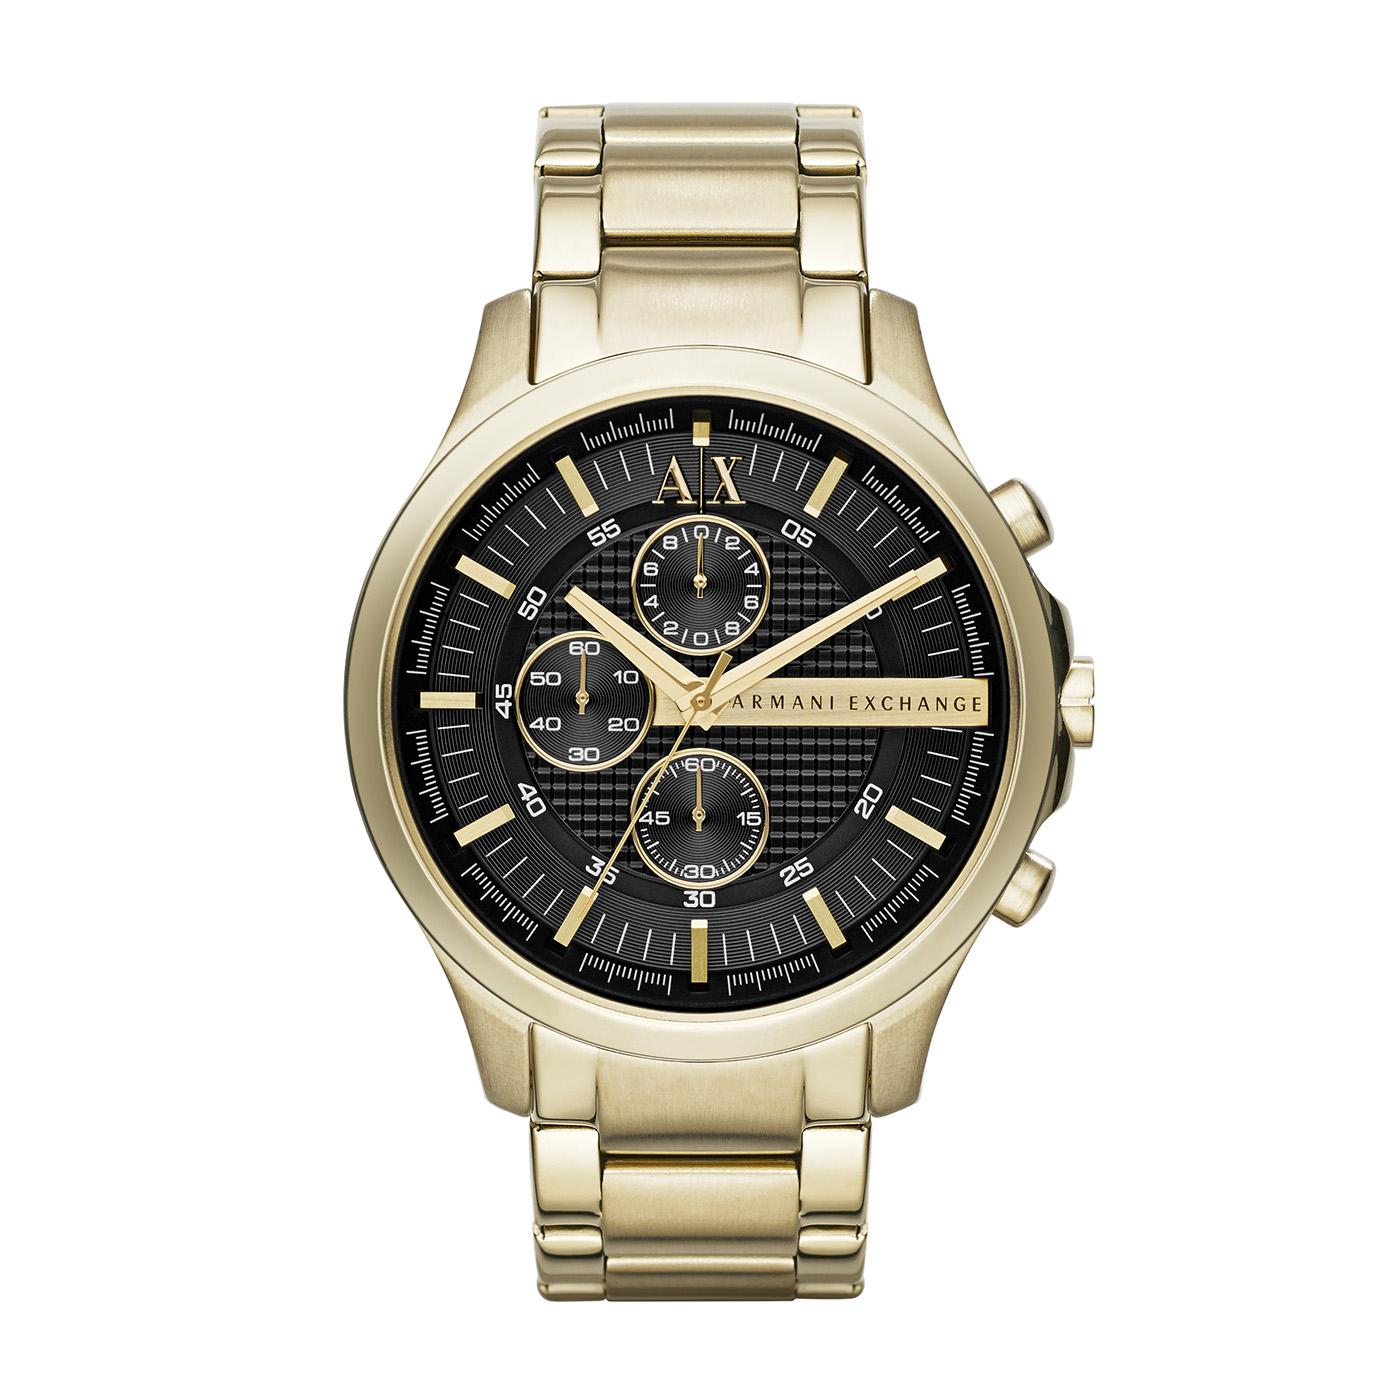 Afbeelding van Armani Exchange Chronograaf horloge AX2137